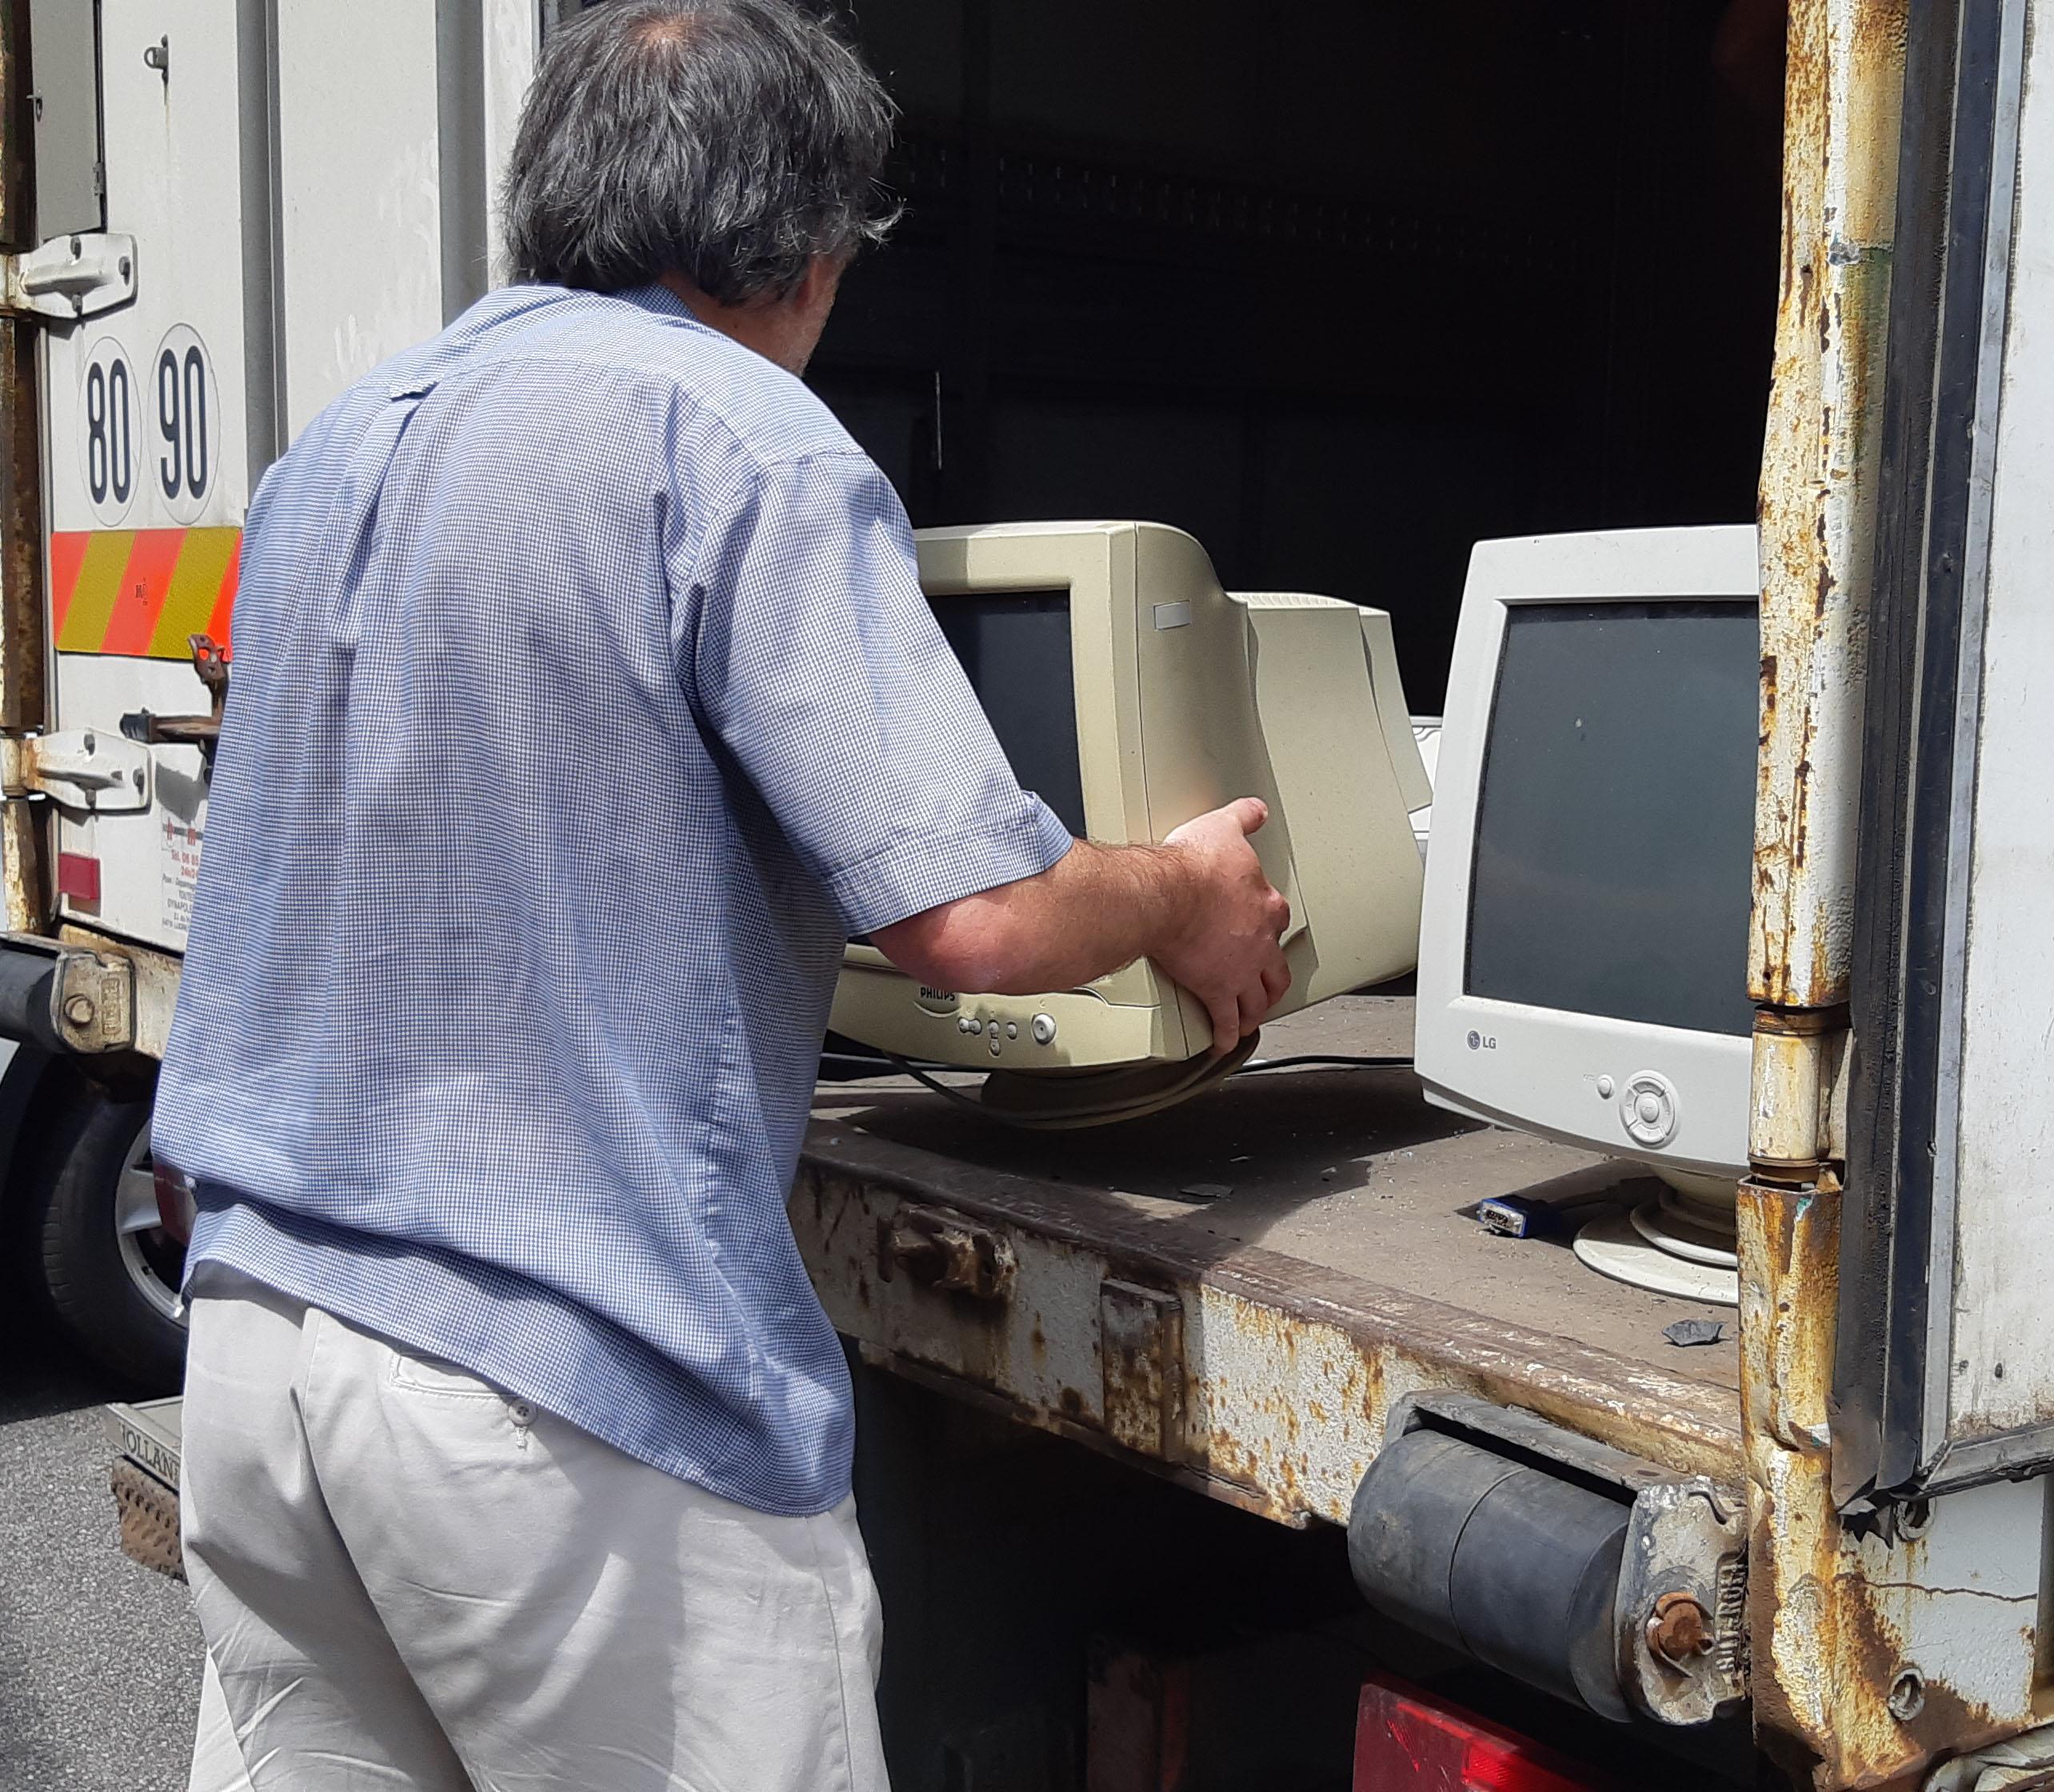 Recyclage du matriel informatique